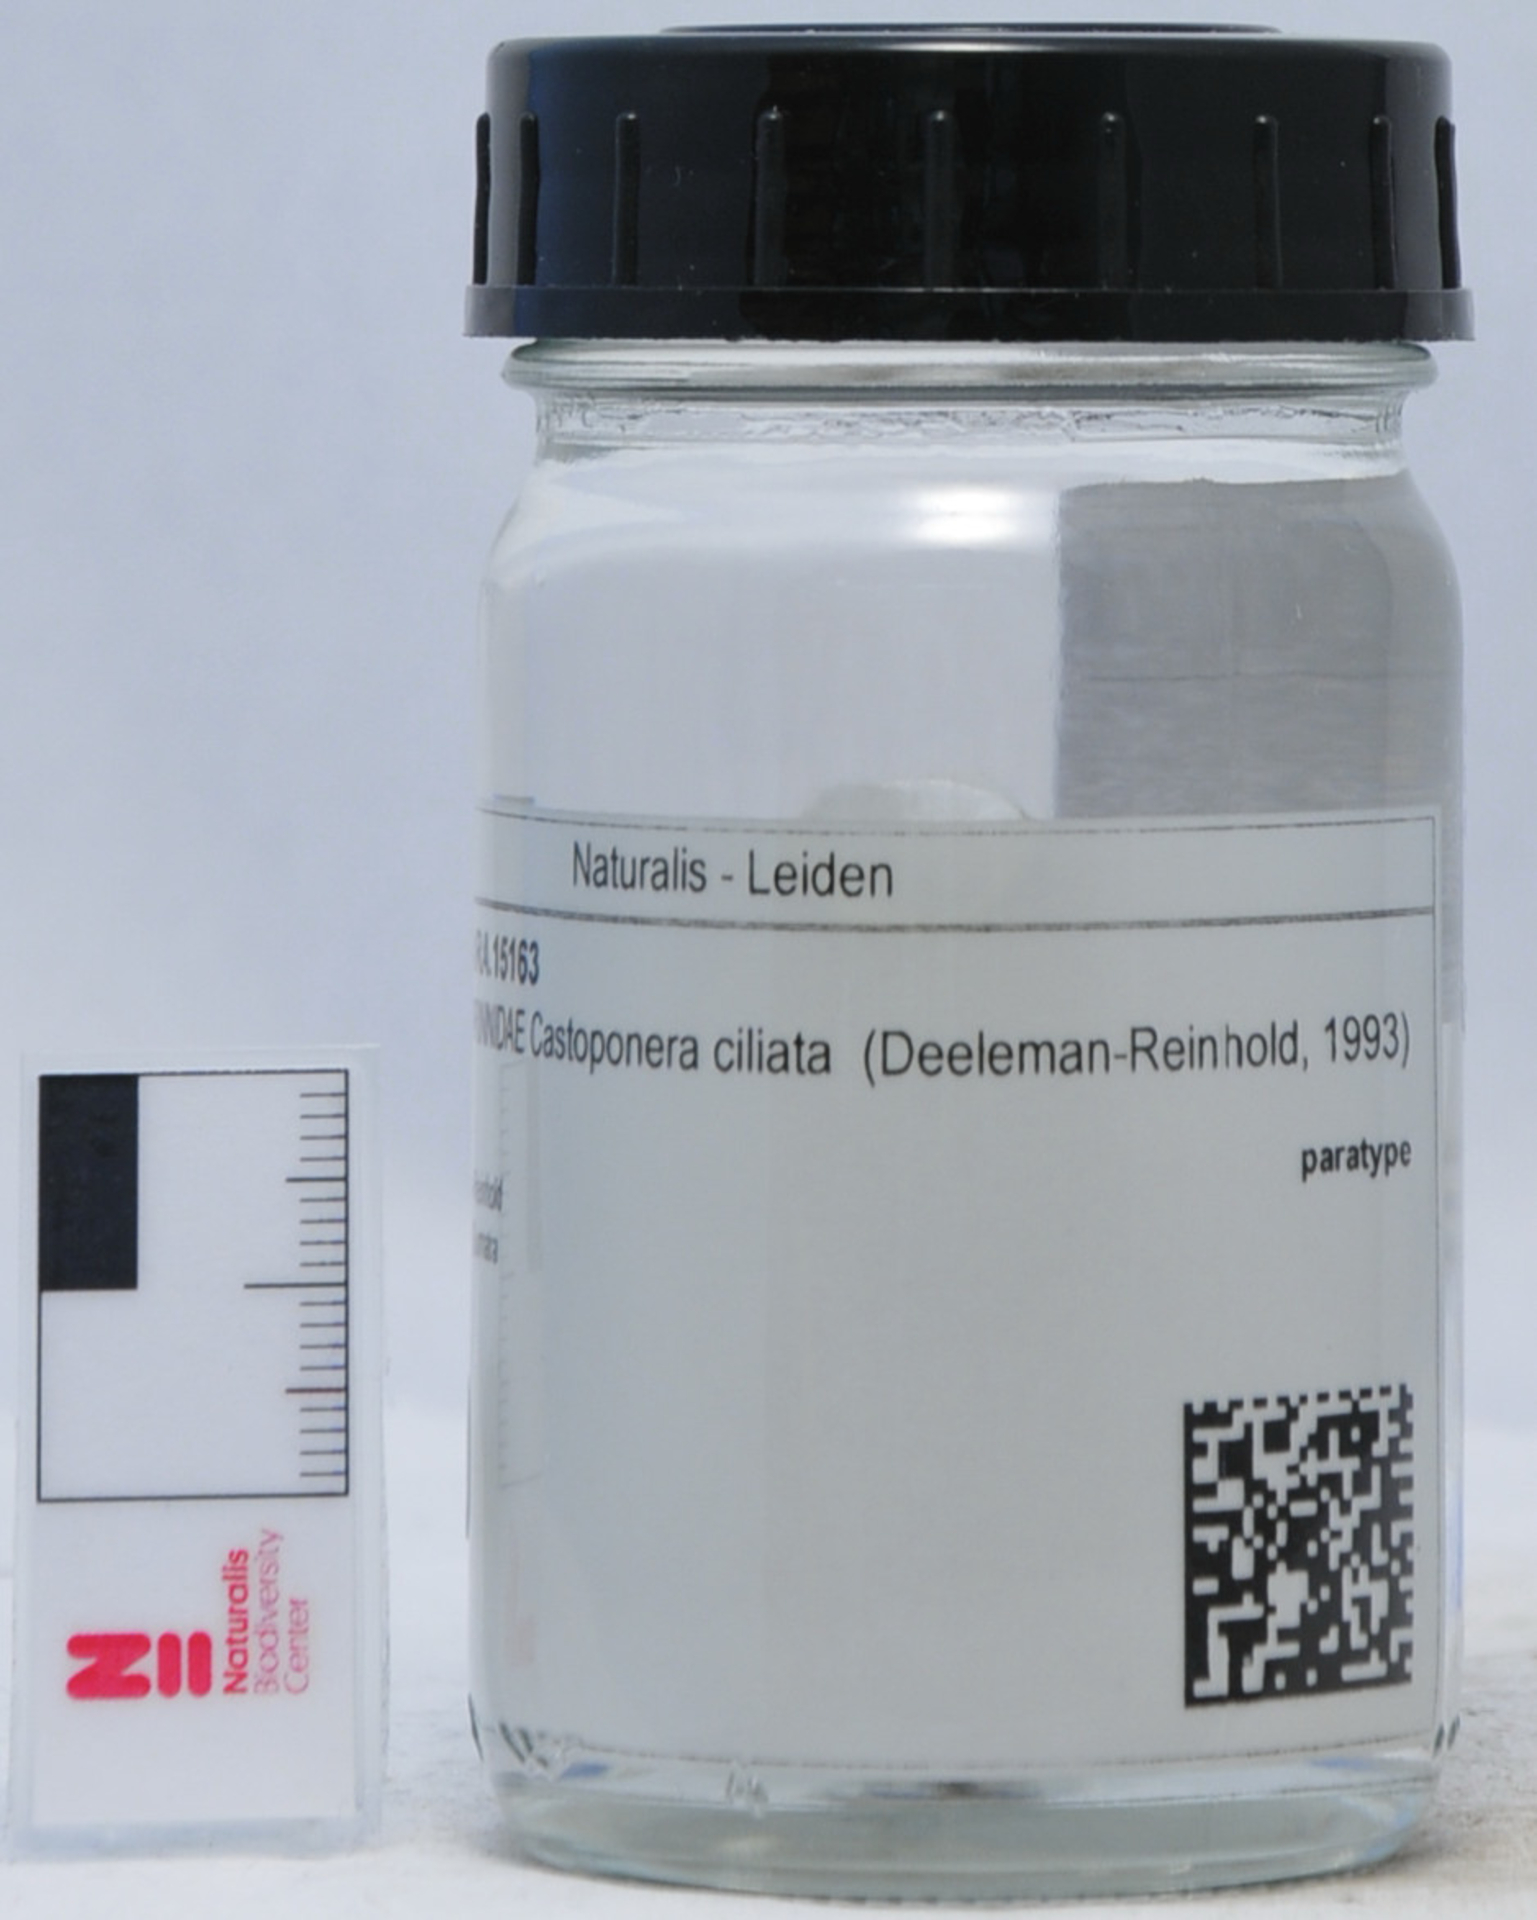 RMNH.ARA.15163 | Castoponera ciliata (Deeleman-Reinhold, 1993)